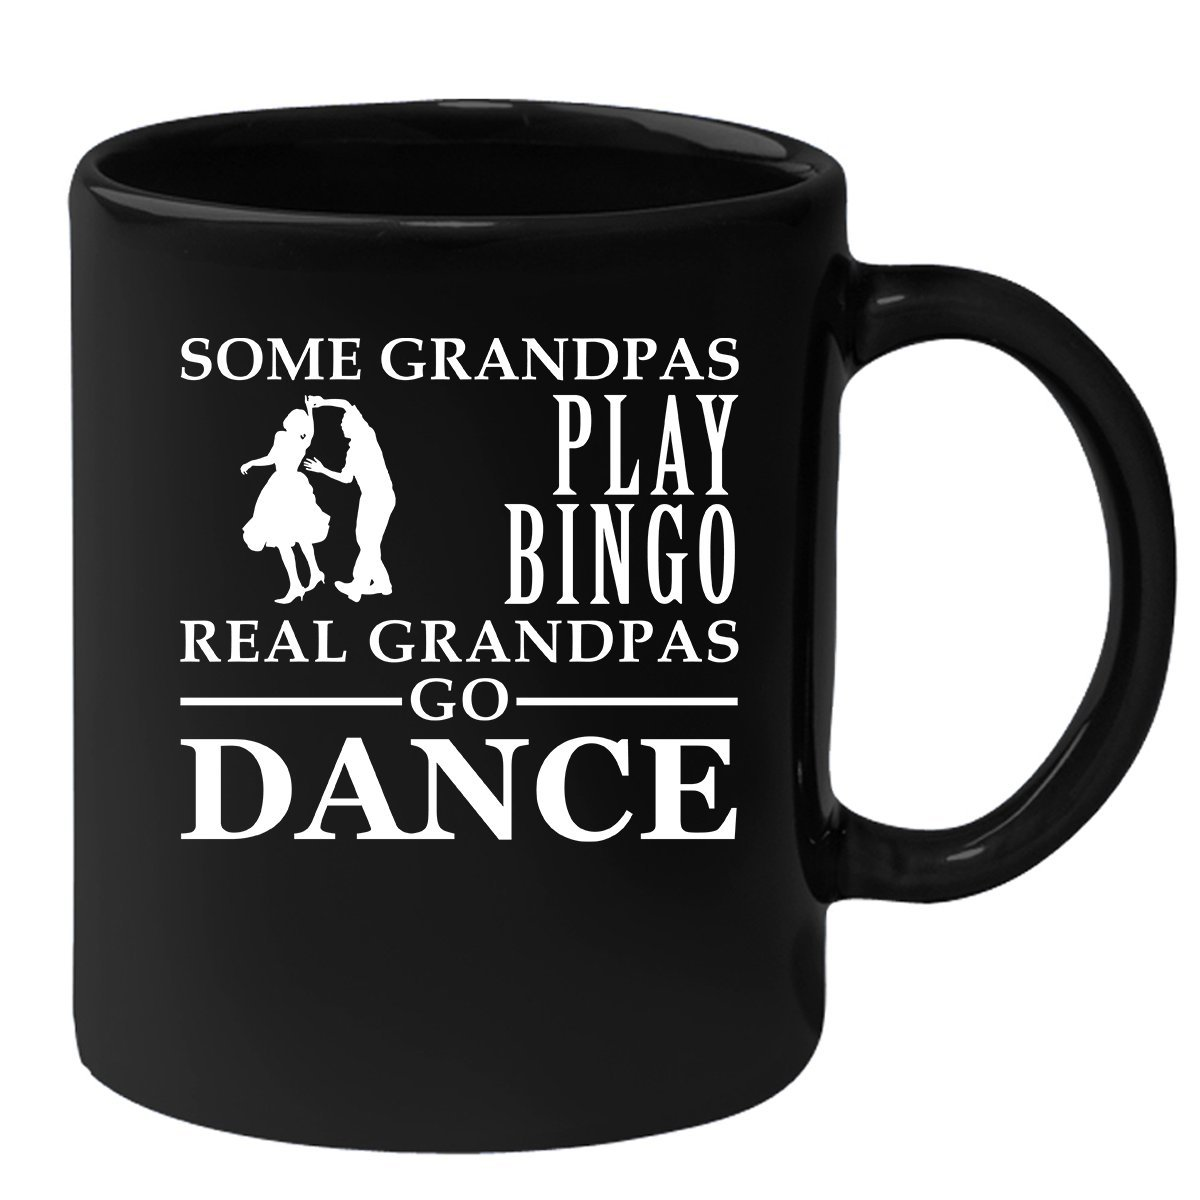 Grandpa Birthday Gift Funny Black Coffee Mug 11oz Some Grandpas play bingo, real Grandpas go Dance